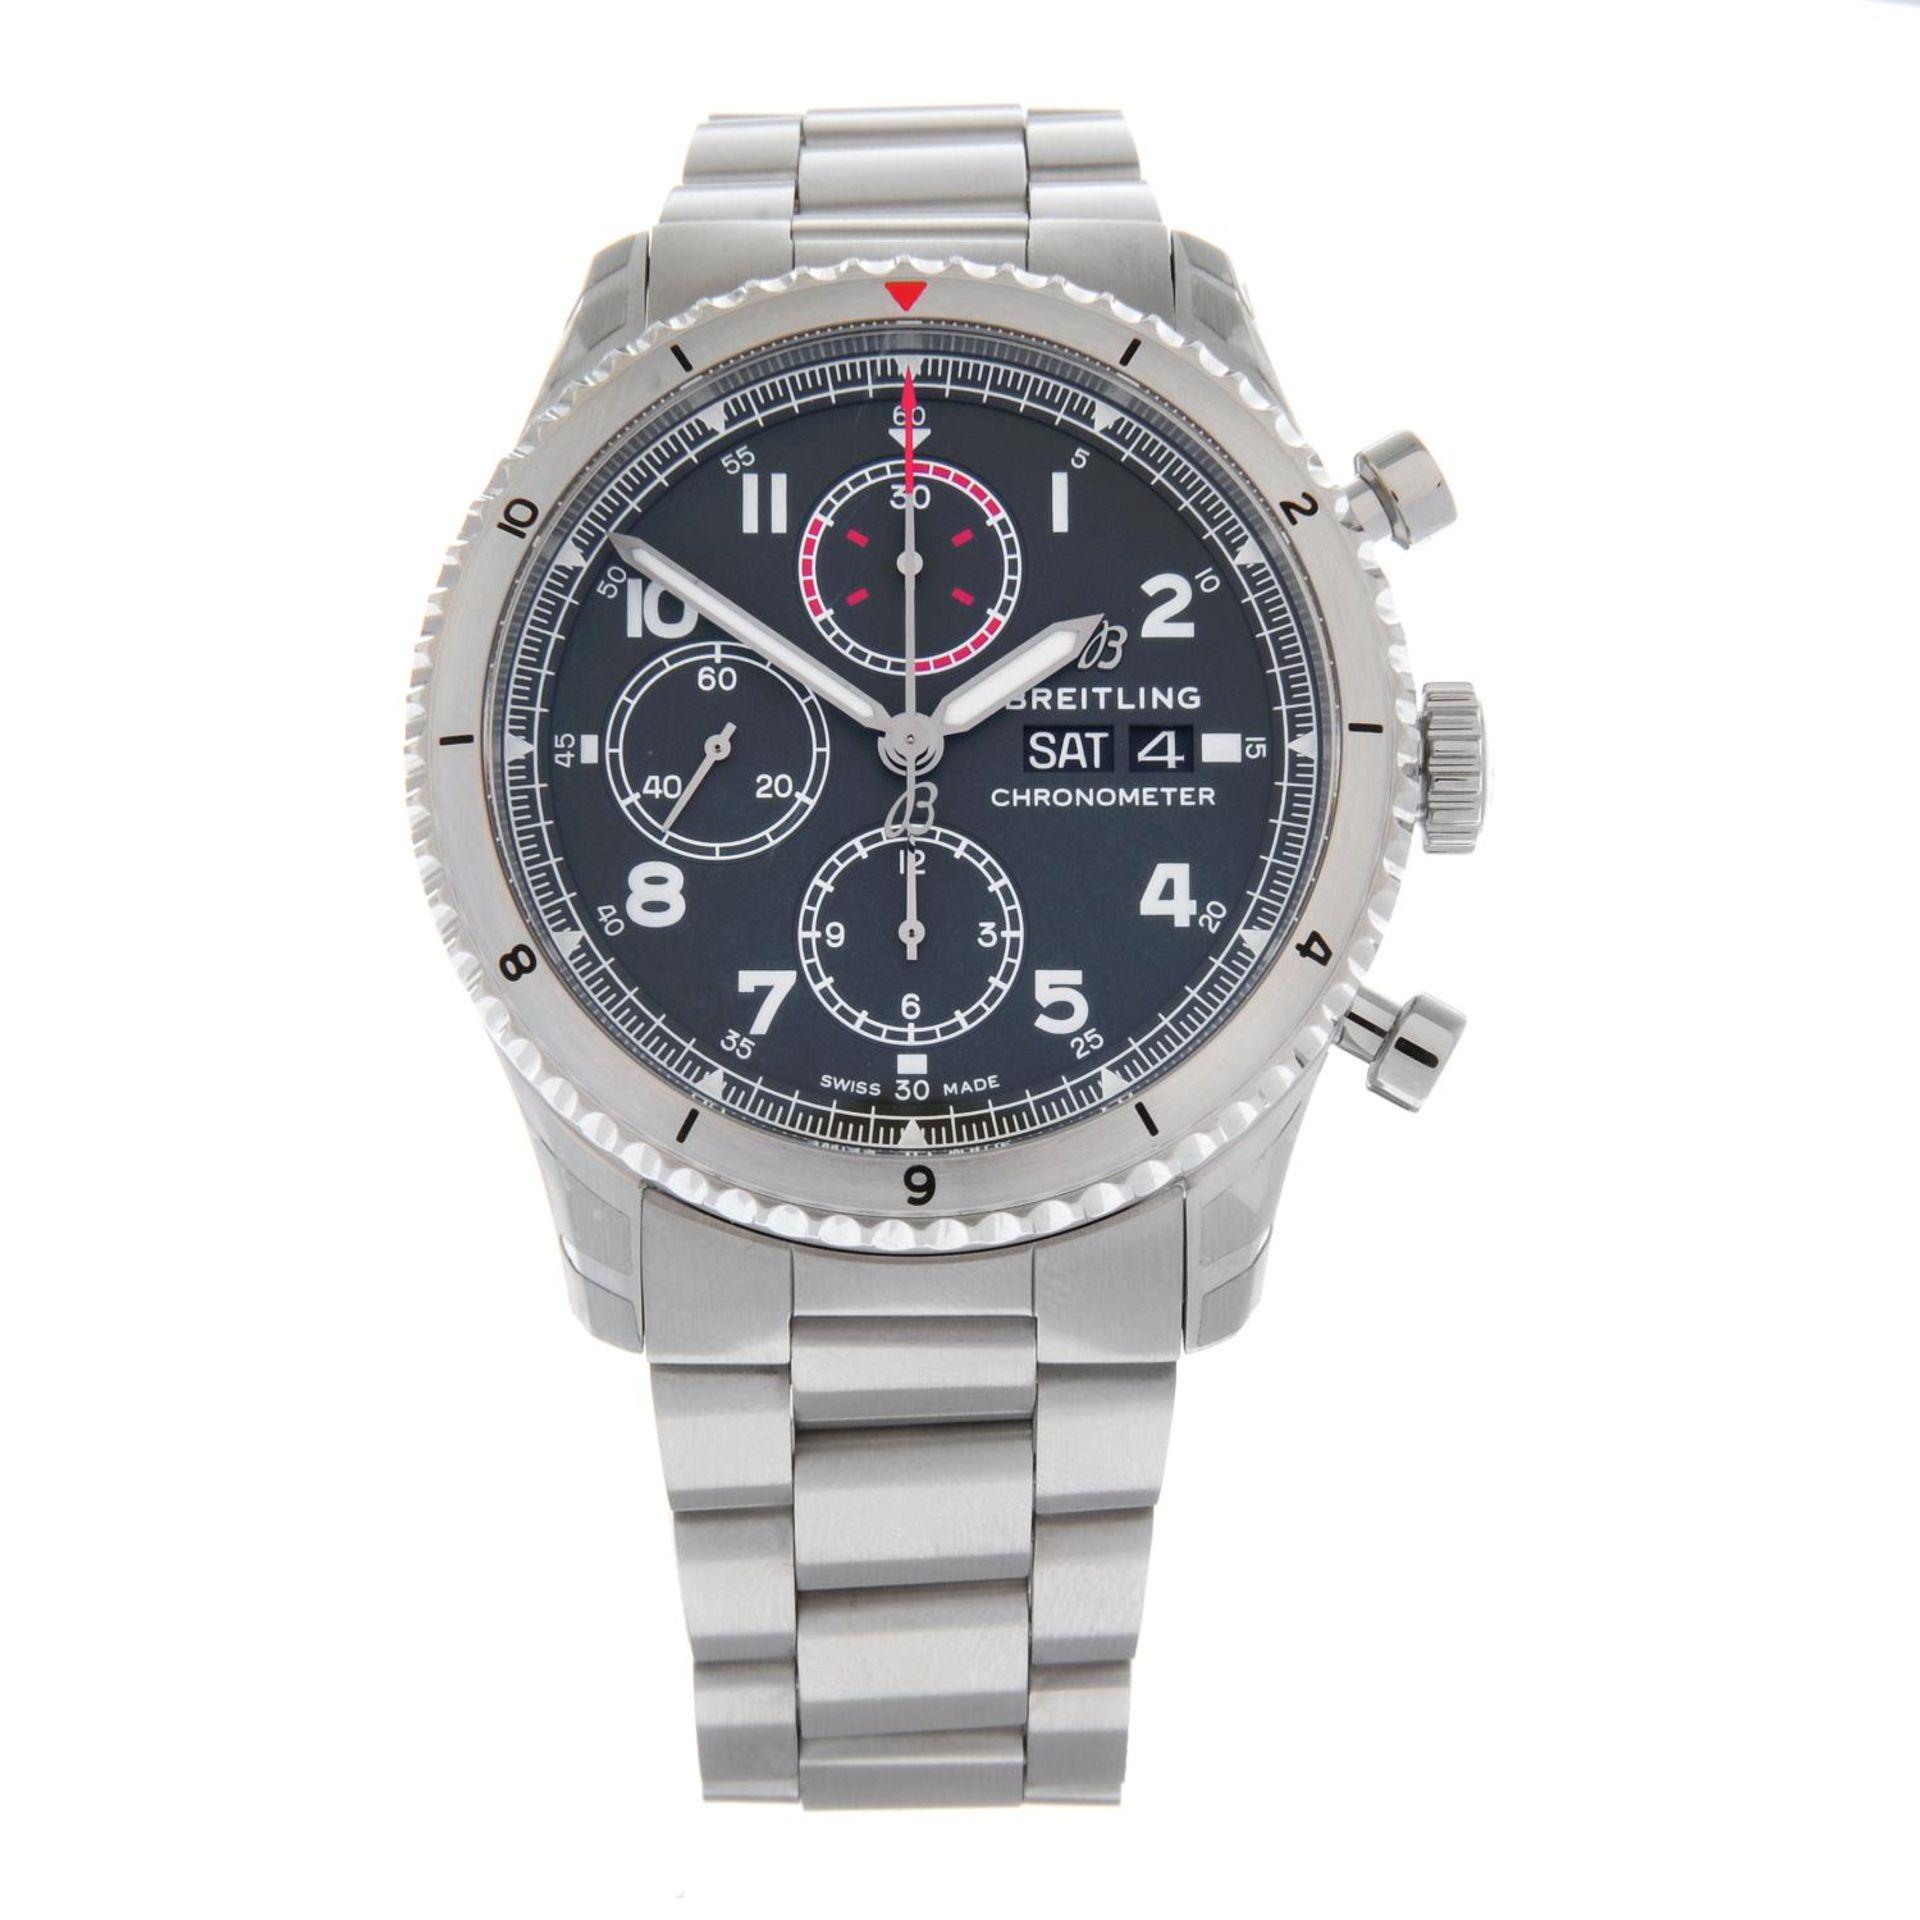 CURRENT MODEL: BREITLING - an Aviator 8 chronograph bracelet watch.